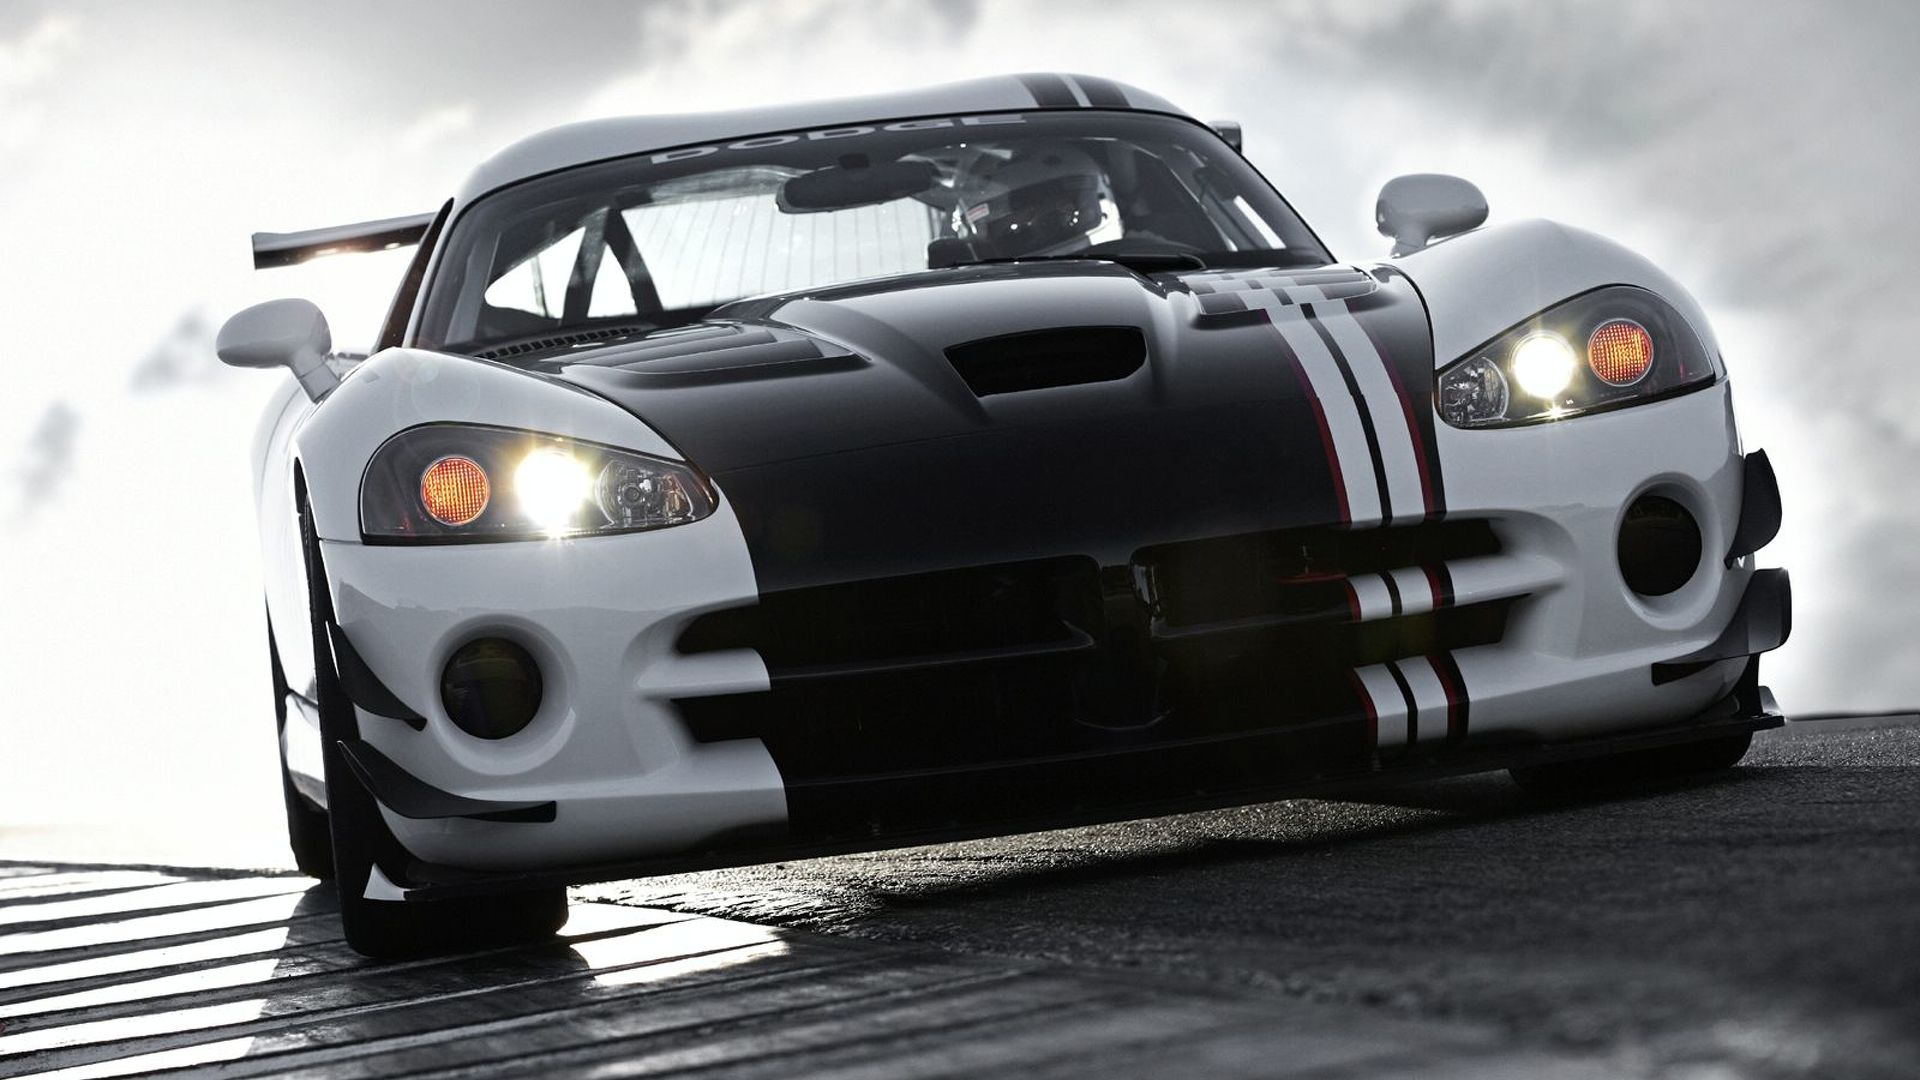 2010 Viper SRT10 ACR-X Revealed [Video]